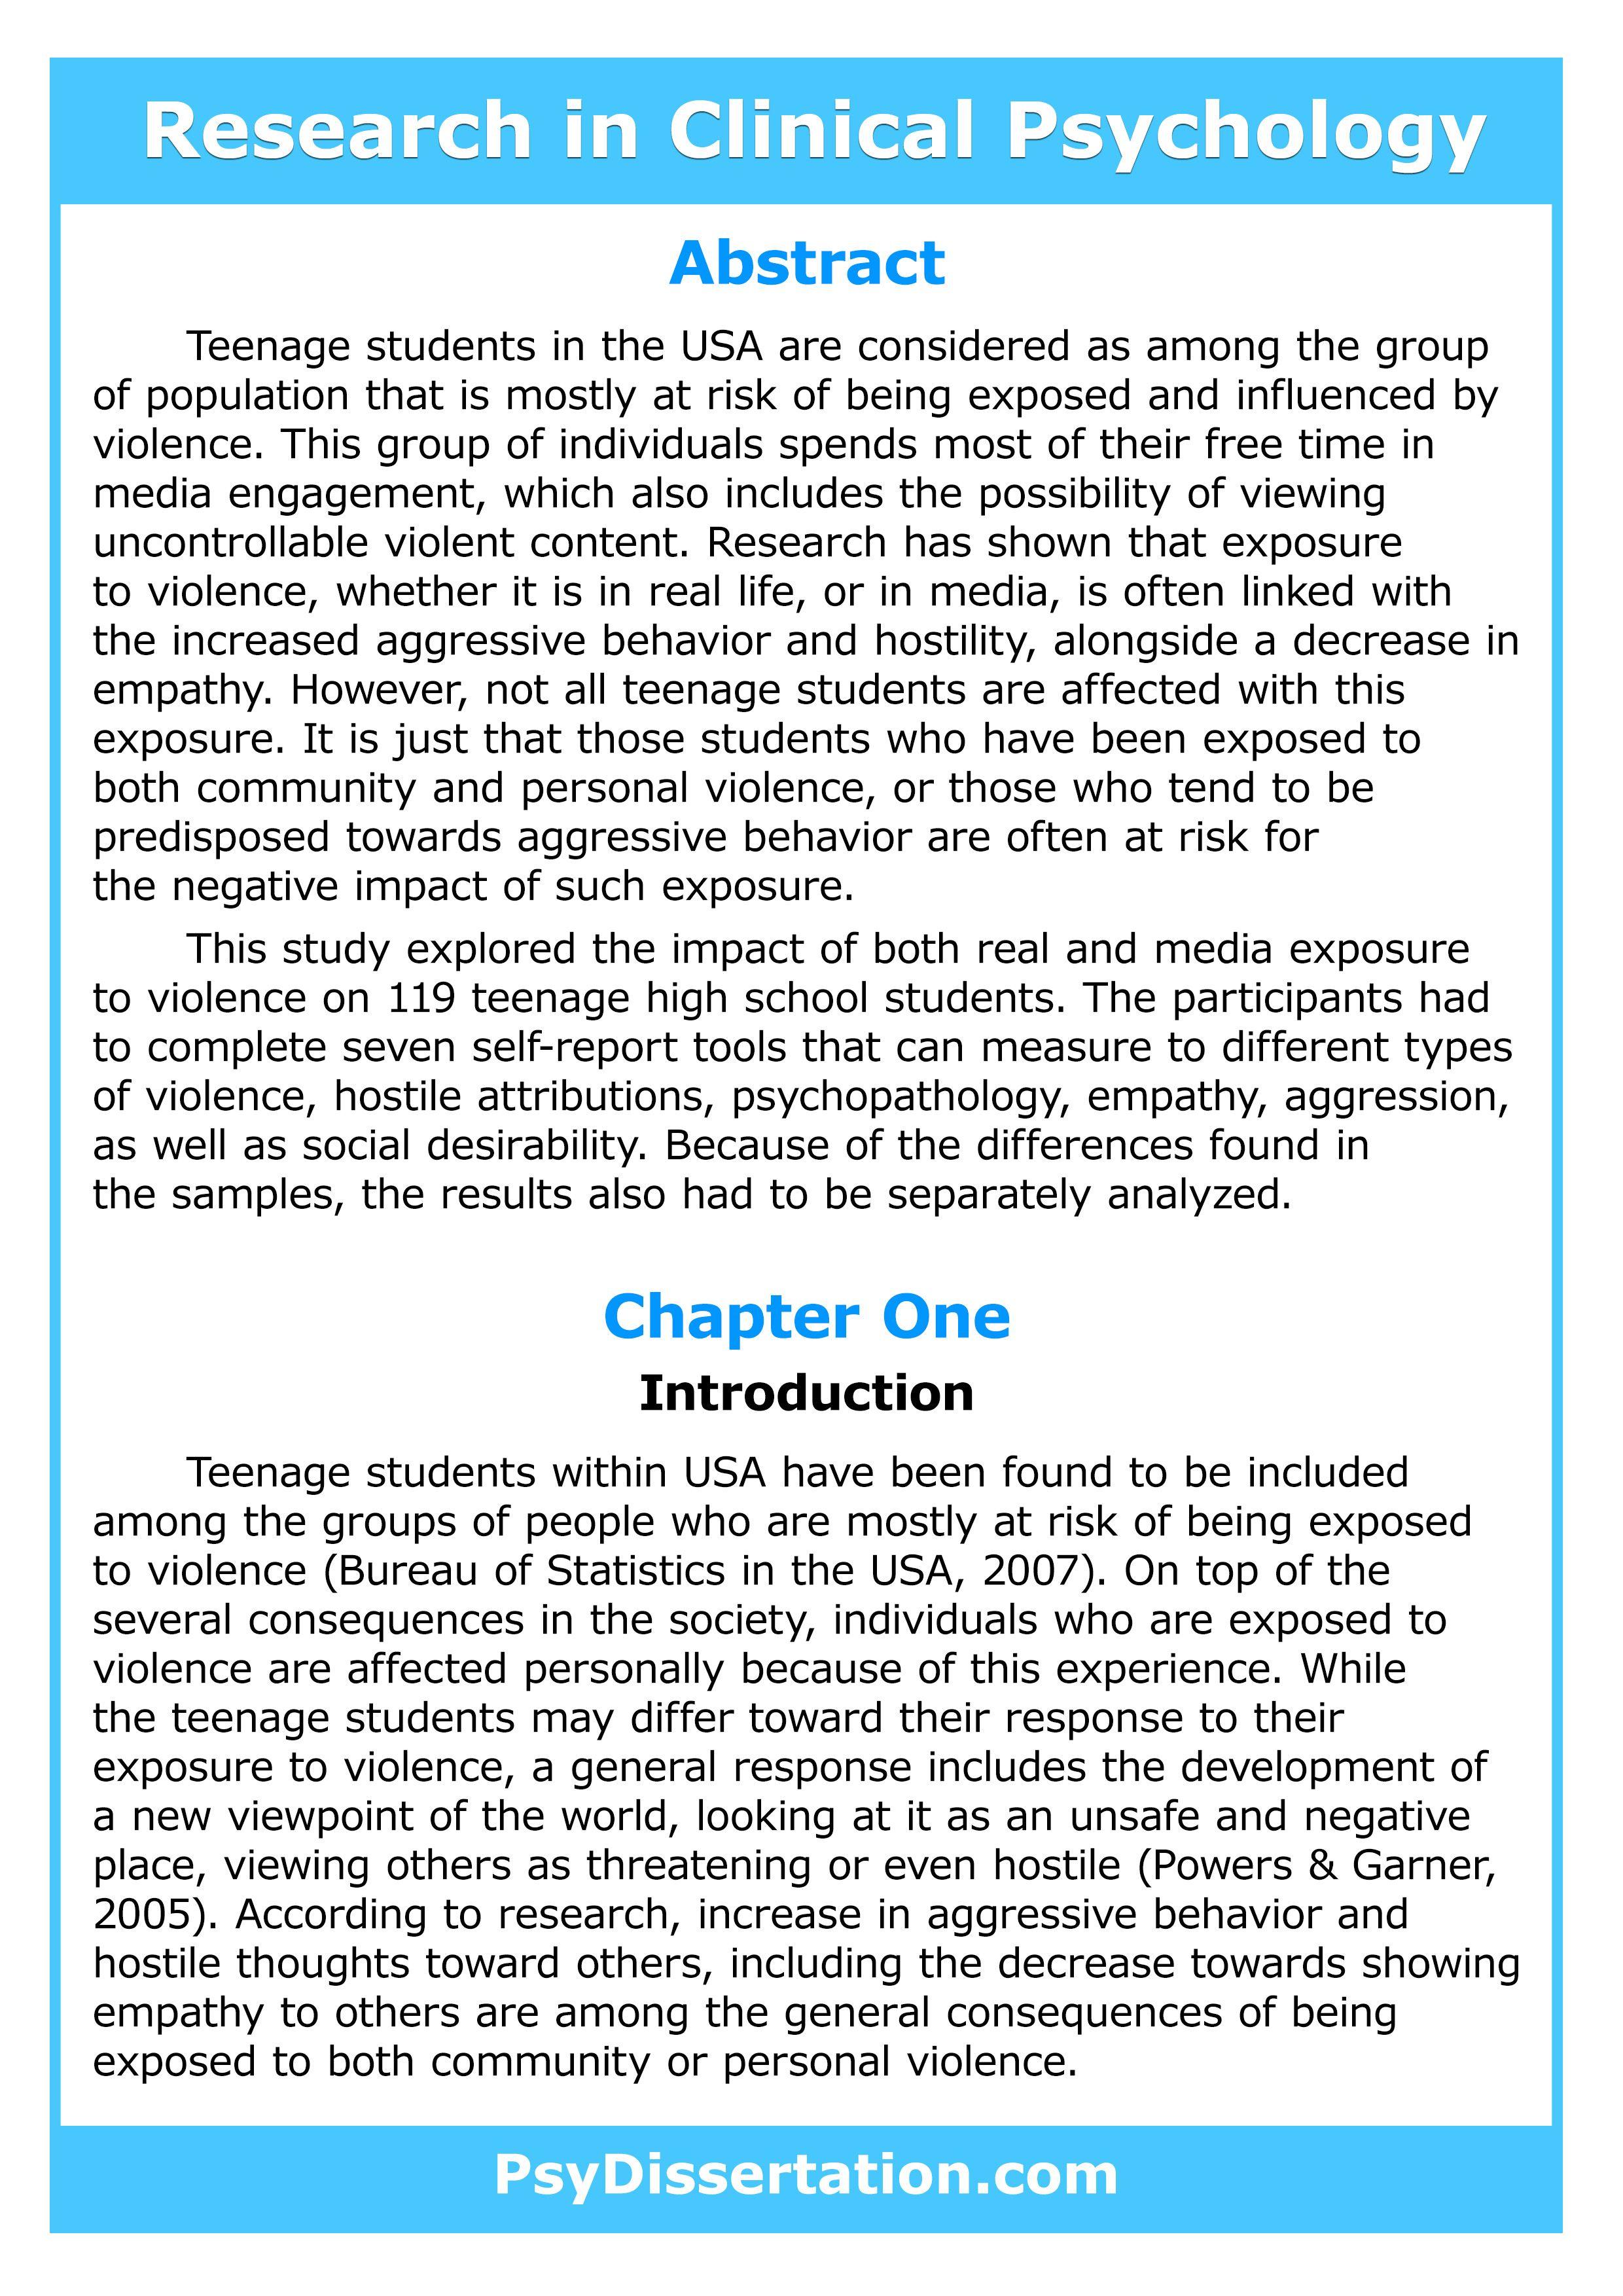 Dissertation grants psychology research